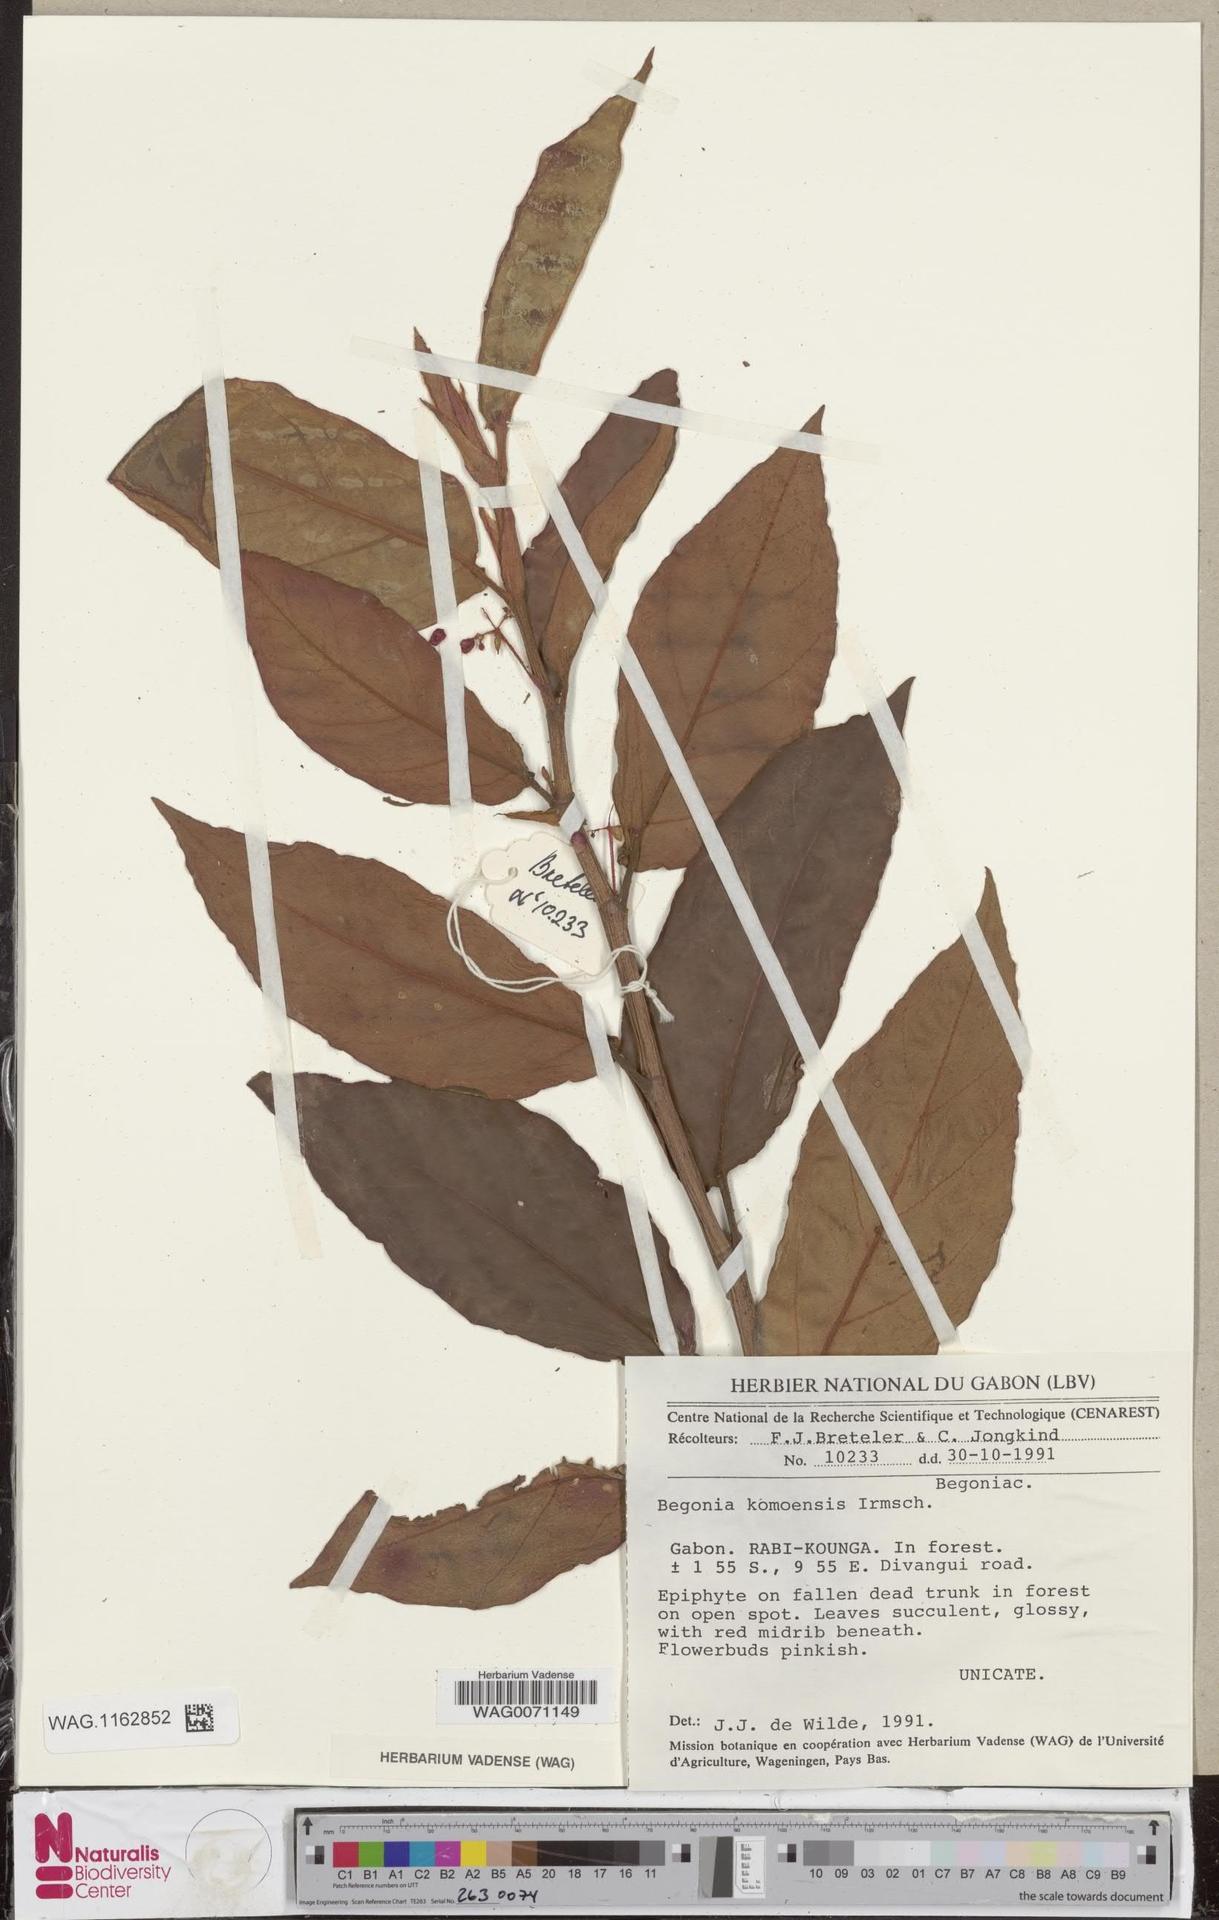 WAG.1162852 | Begonia komoensis Irmsch.